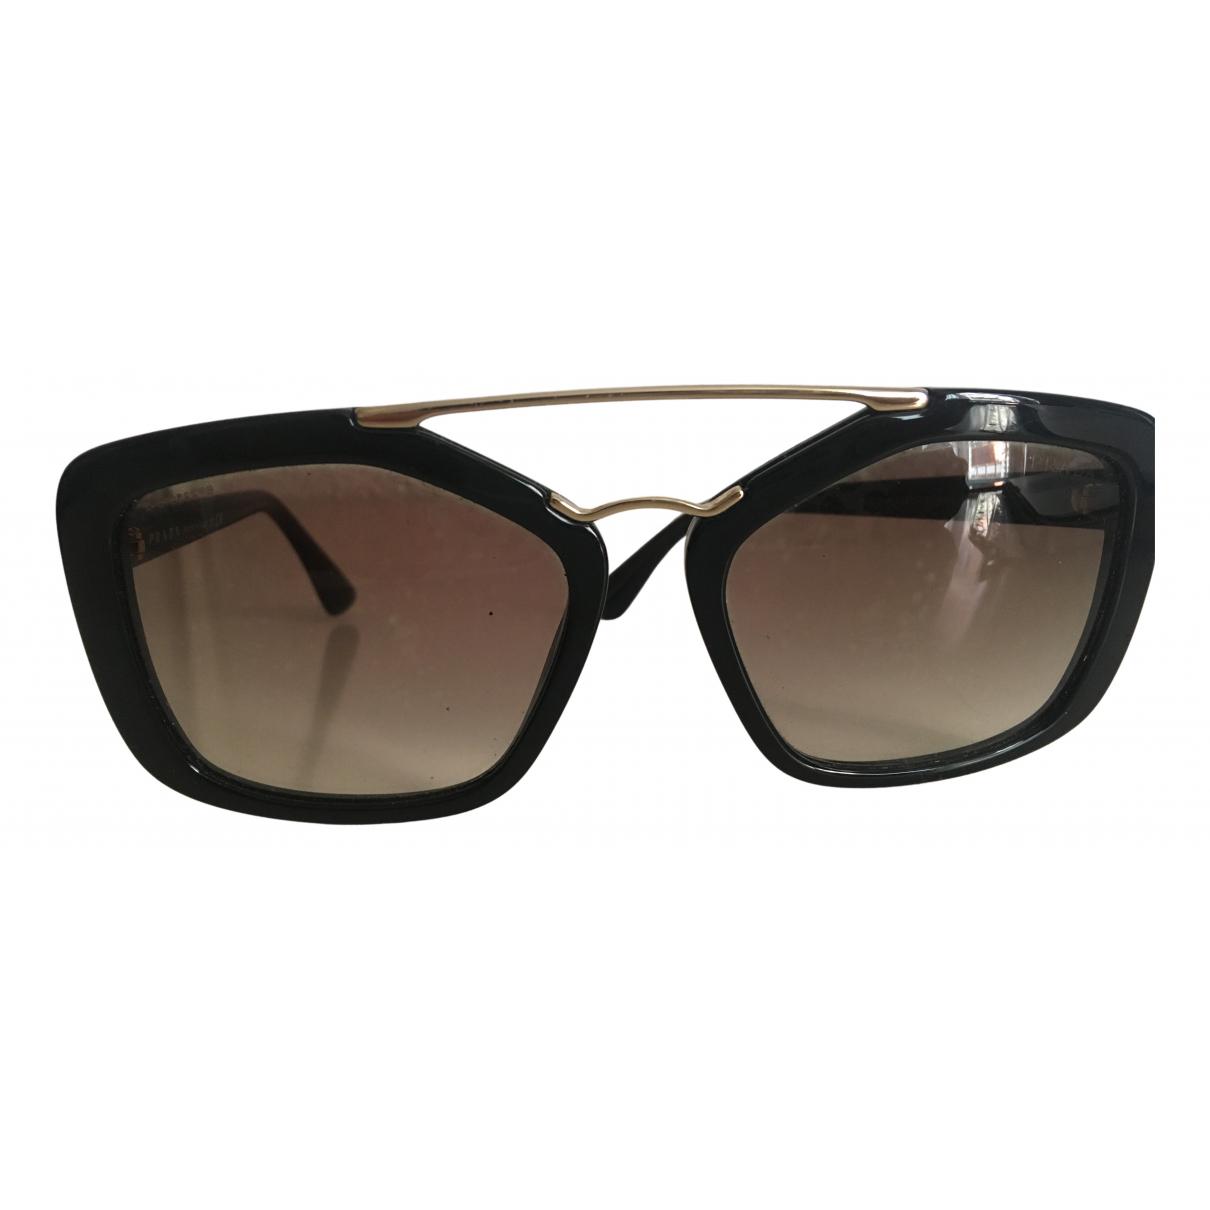 Prada N Black Sunglasses for Women N